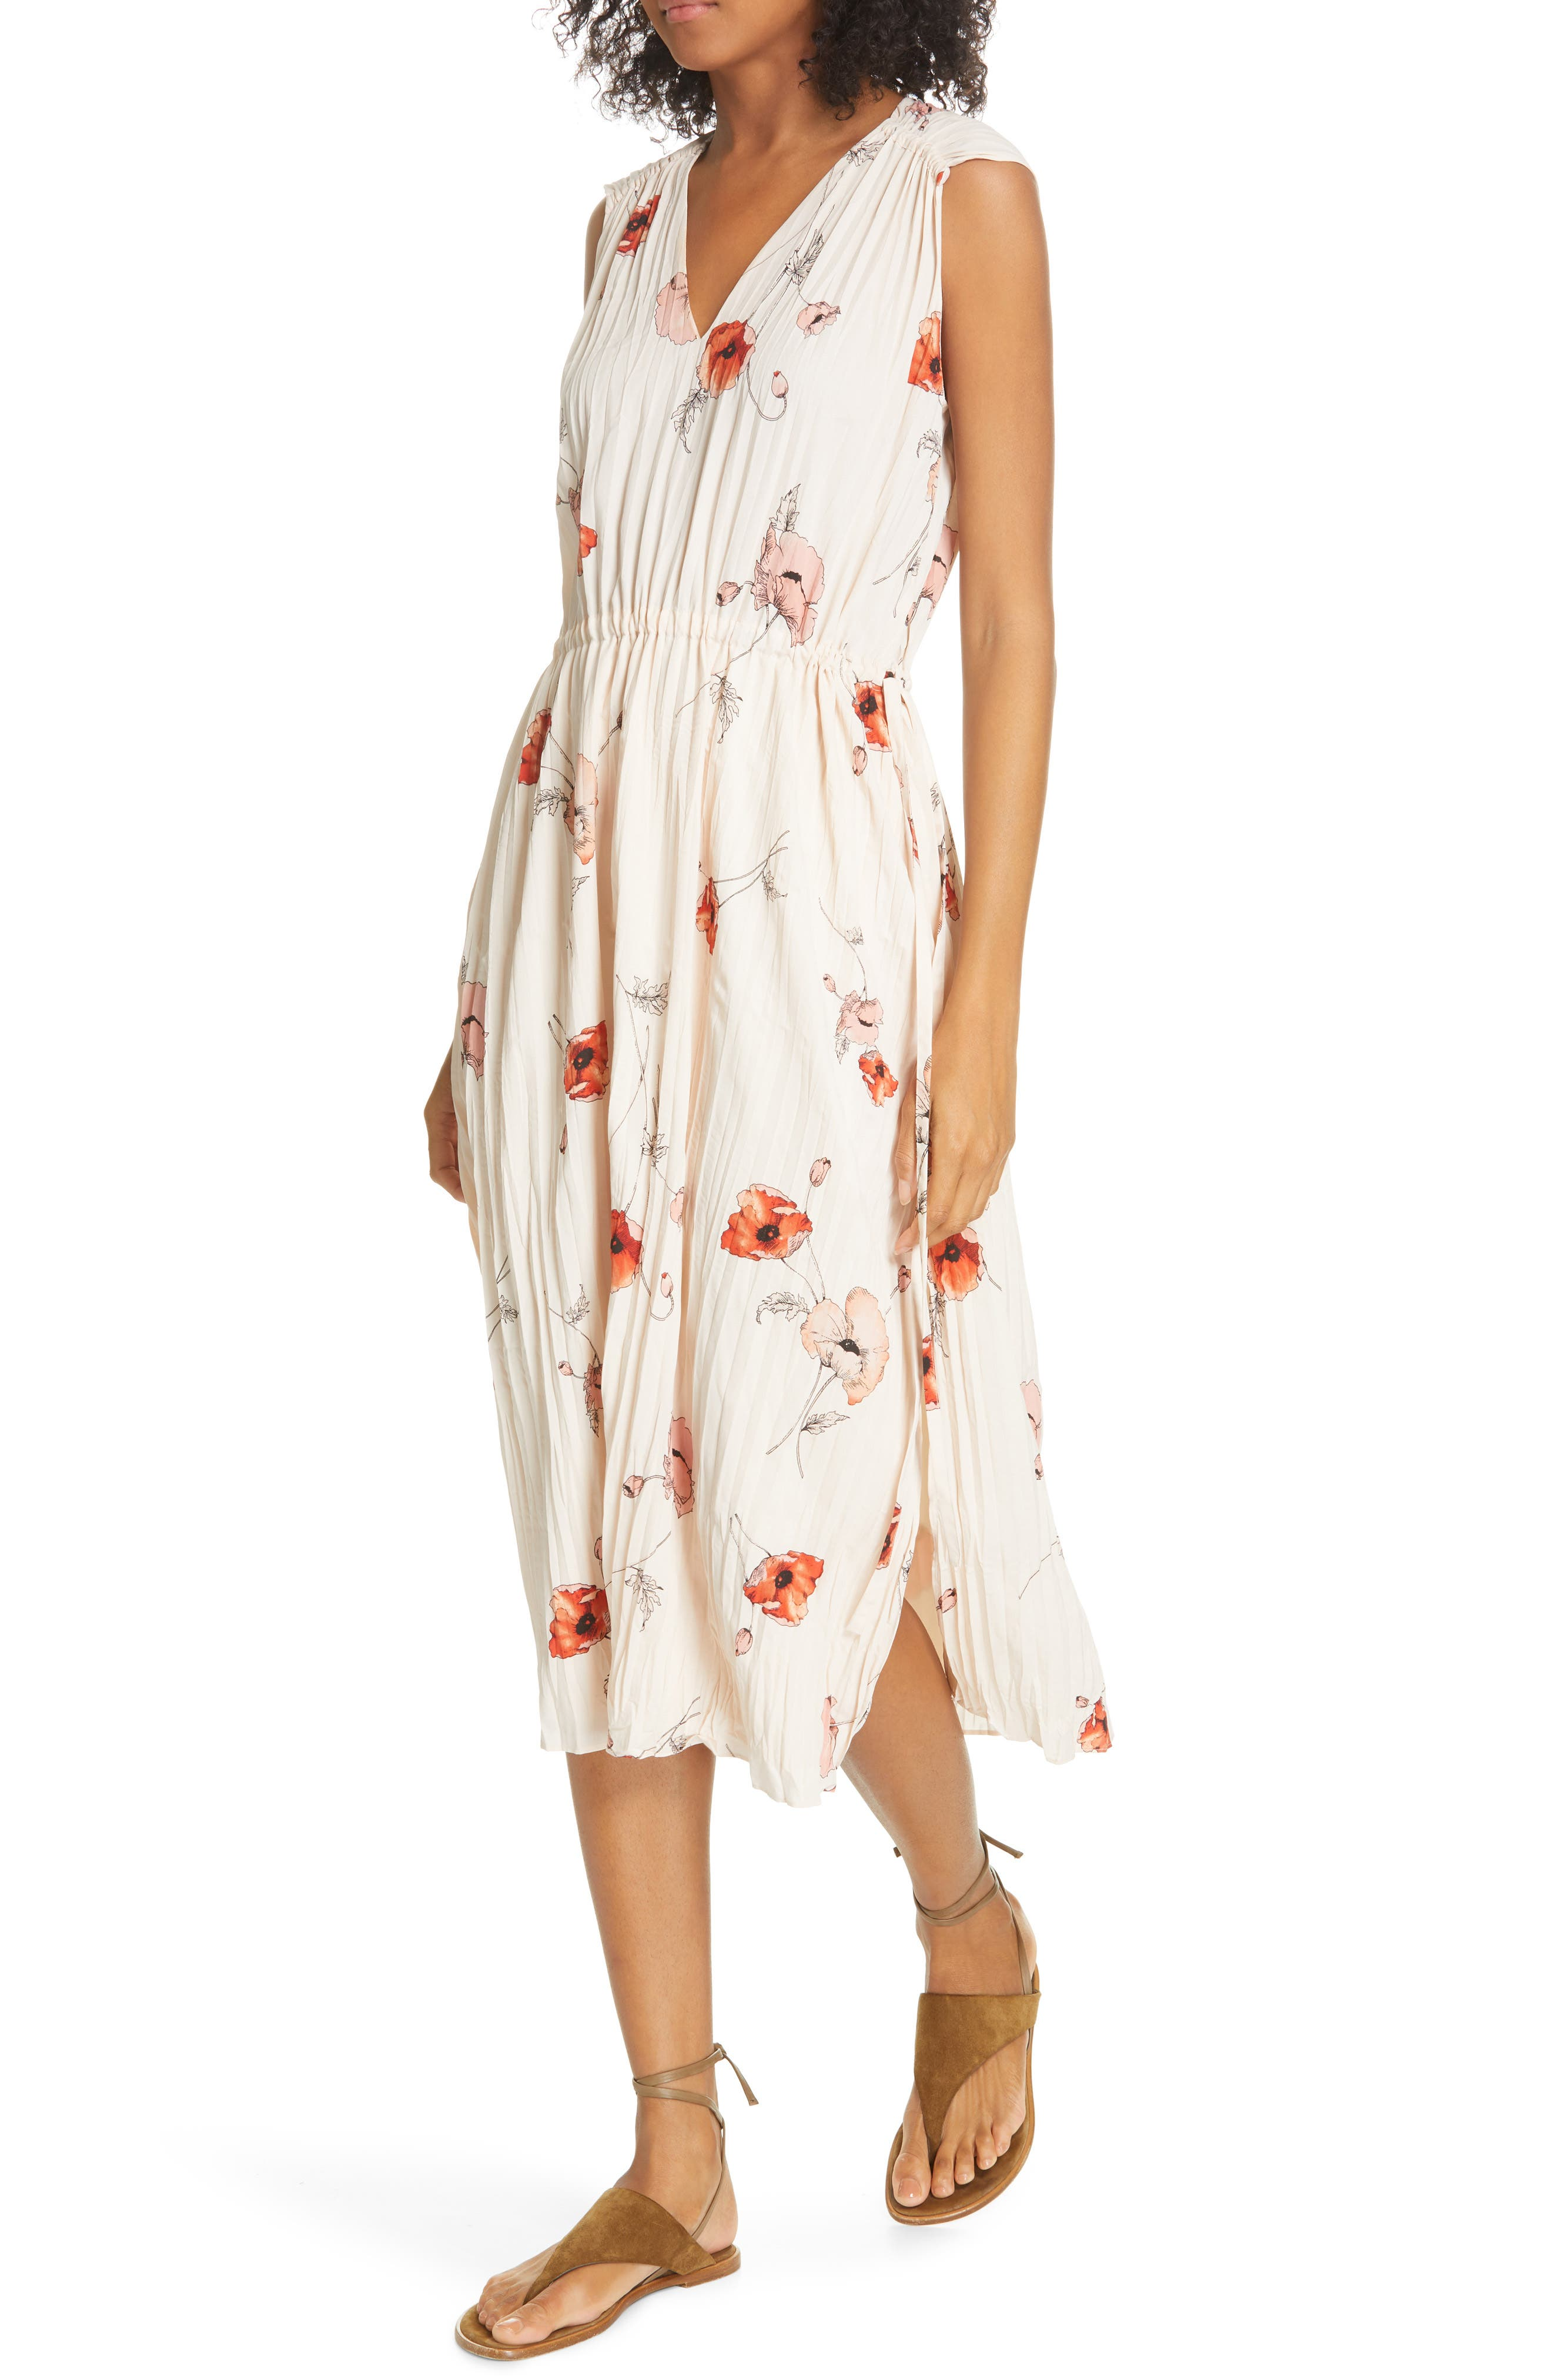 VINCE, Tossed Poppy Pleated Midi Dress, Alternate thumbnail 5, color, PALE BLUSH